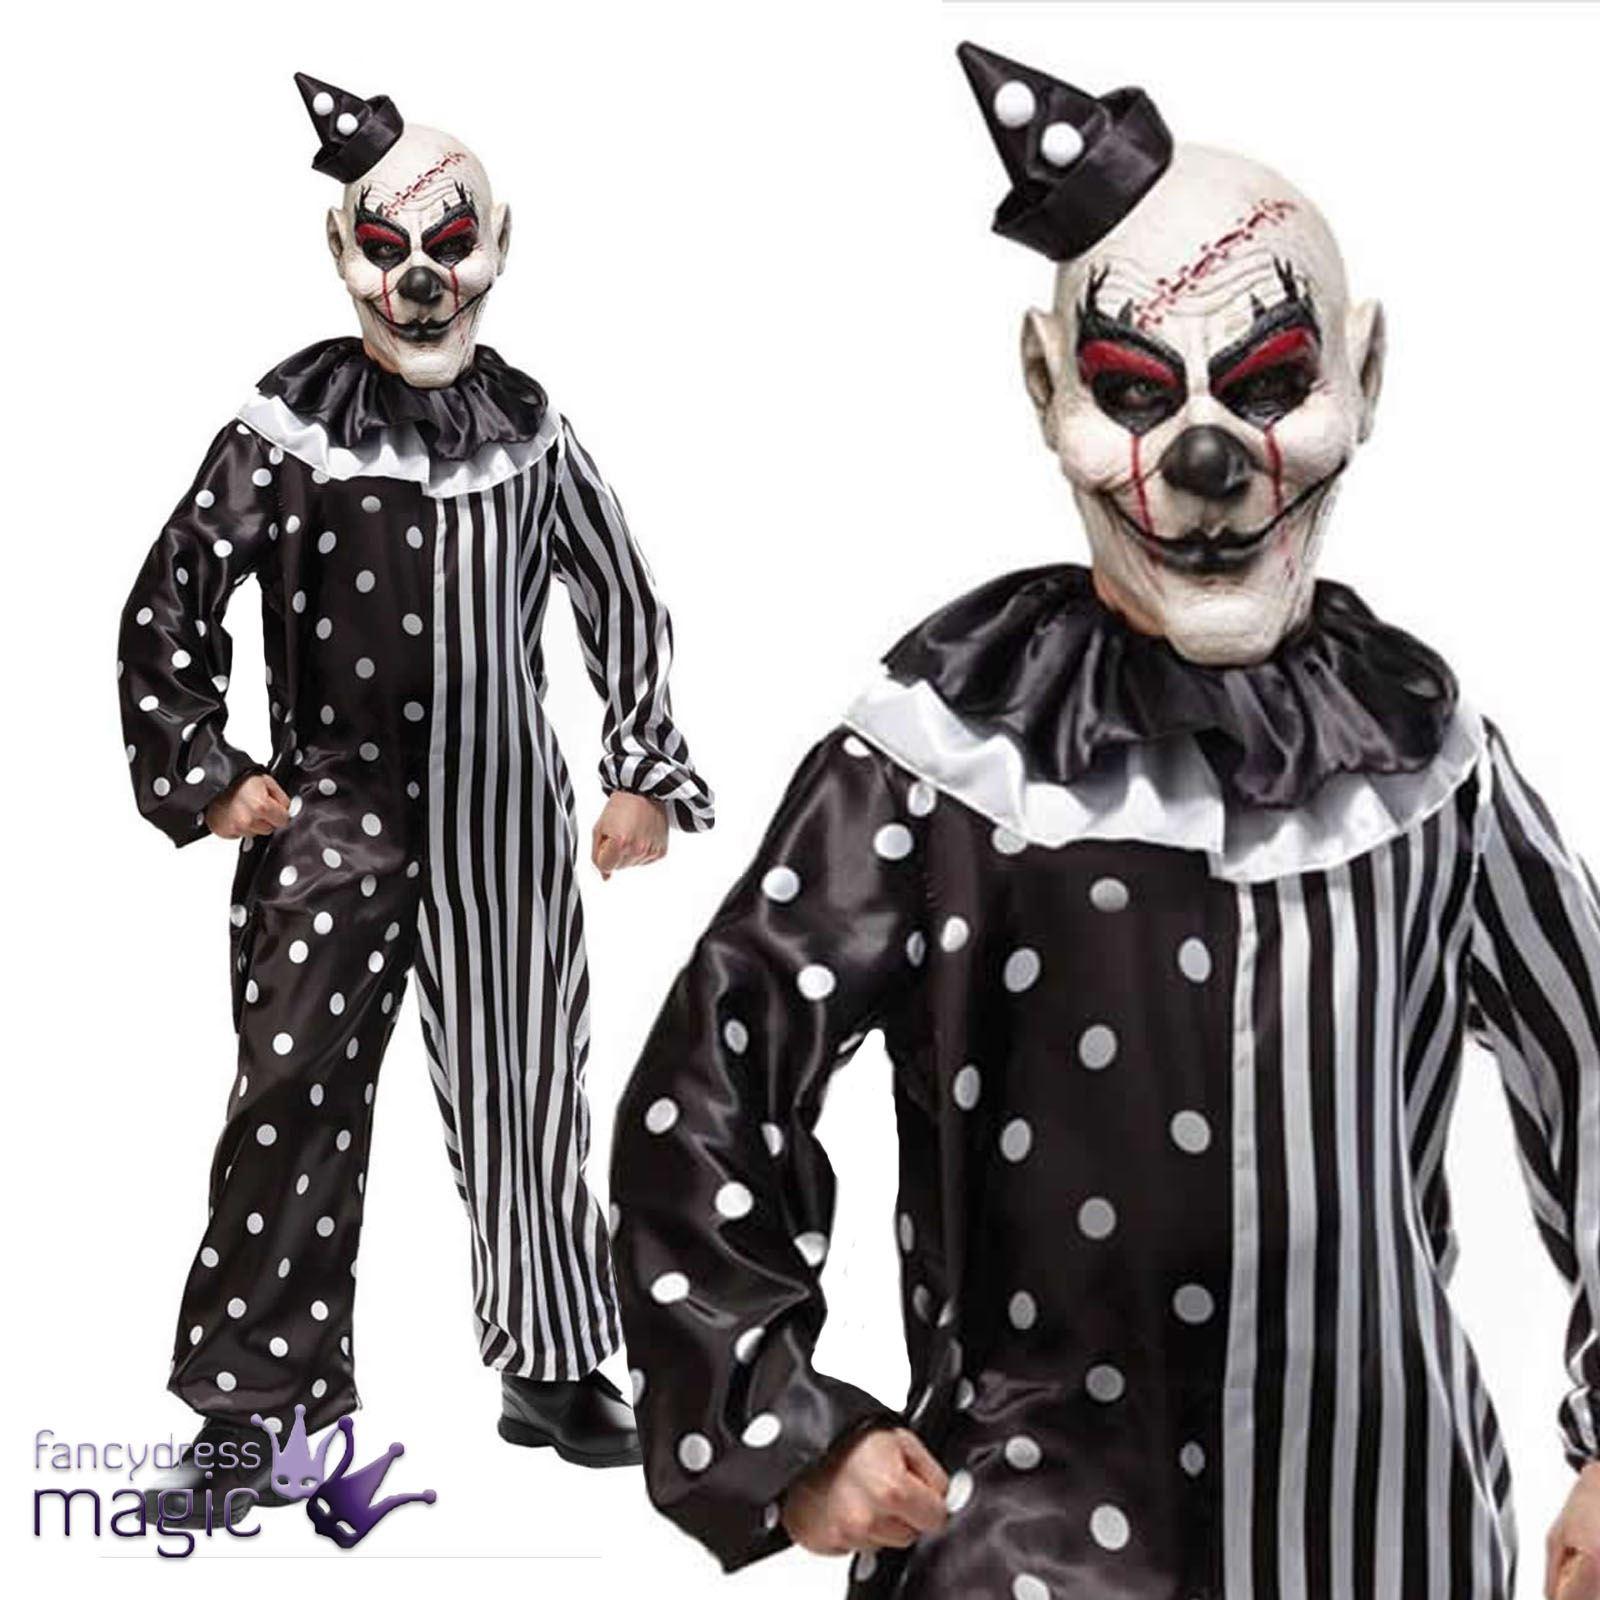 infantil-EVIL-KILLJOY-KLOWN-Payaso-Disfraz-de-horror-para-Halloween-amp